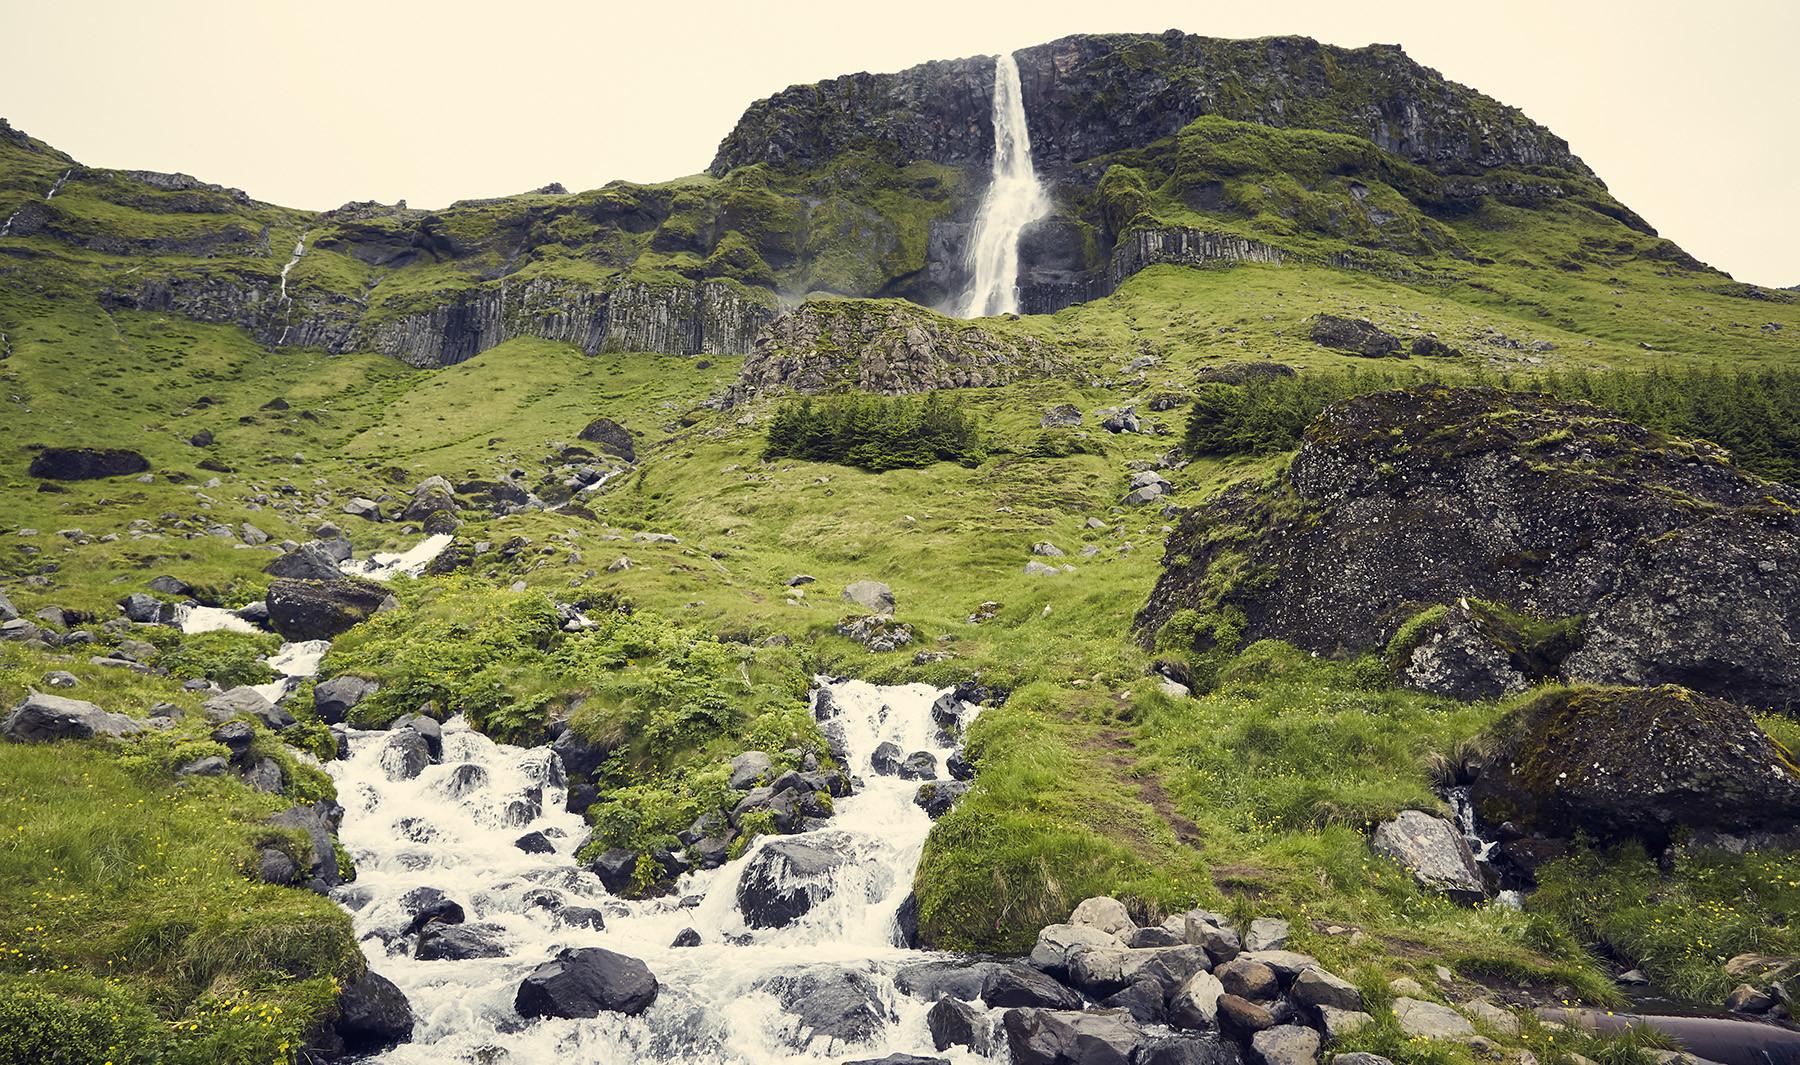 Snaeffelsnes, Geheimtipp, Sheeps Waterfall, Sheep's waterfall, Island, Iceland, Roadtrip, Urlaubsplanung, Urlaub, Rundreise, Tagesausflug